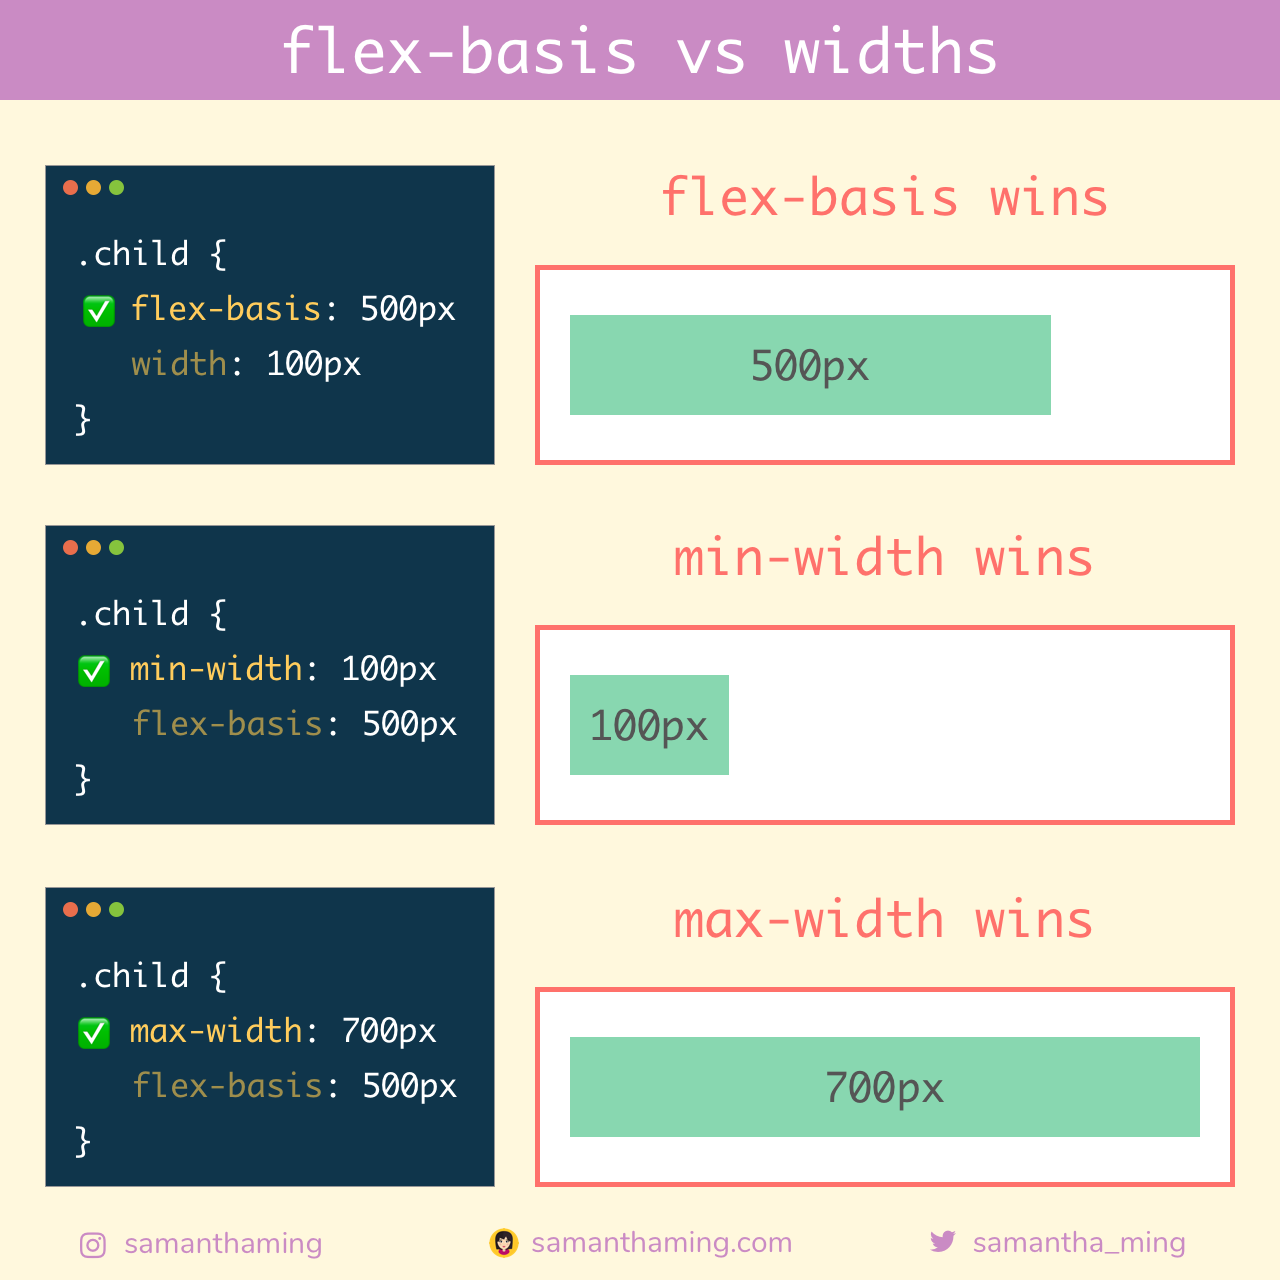 flex-basis vs widths